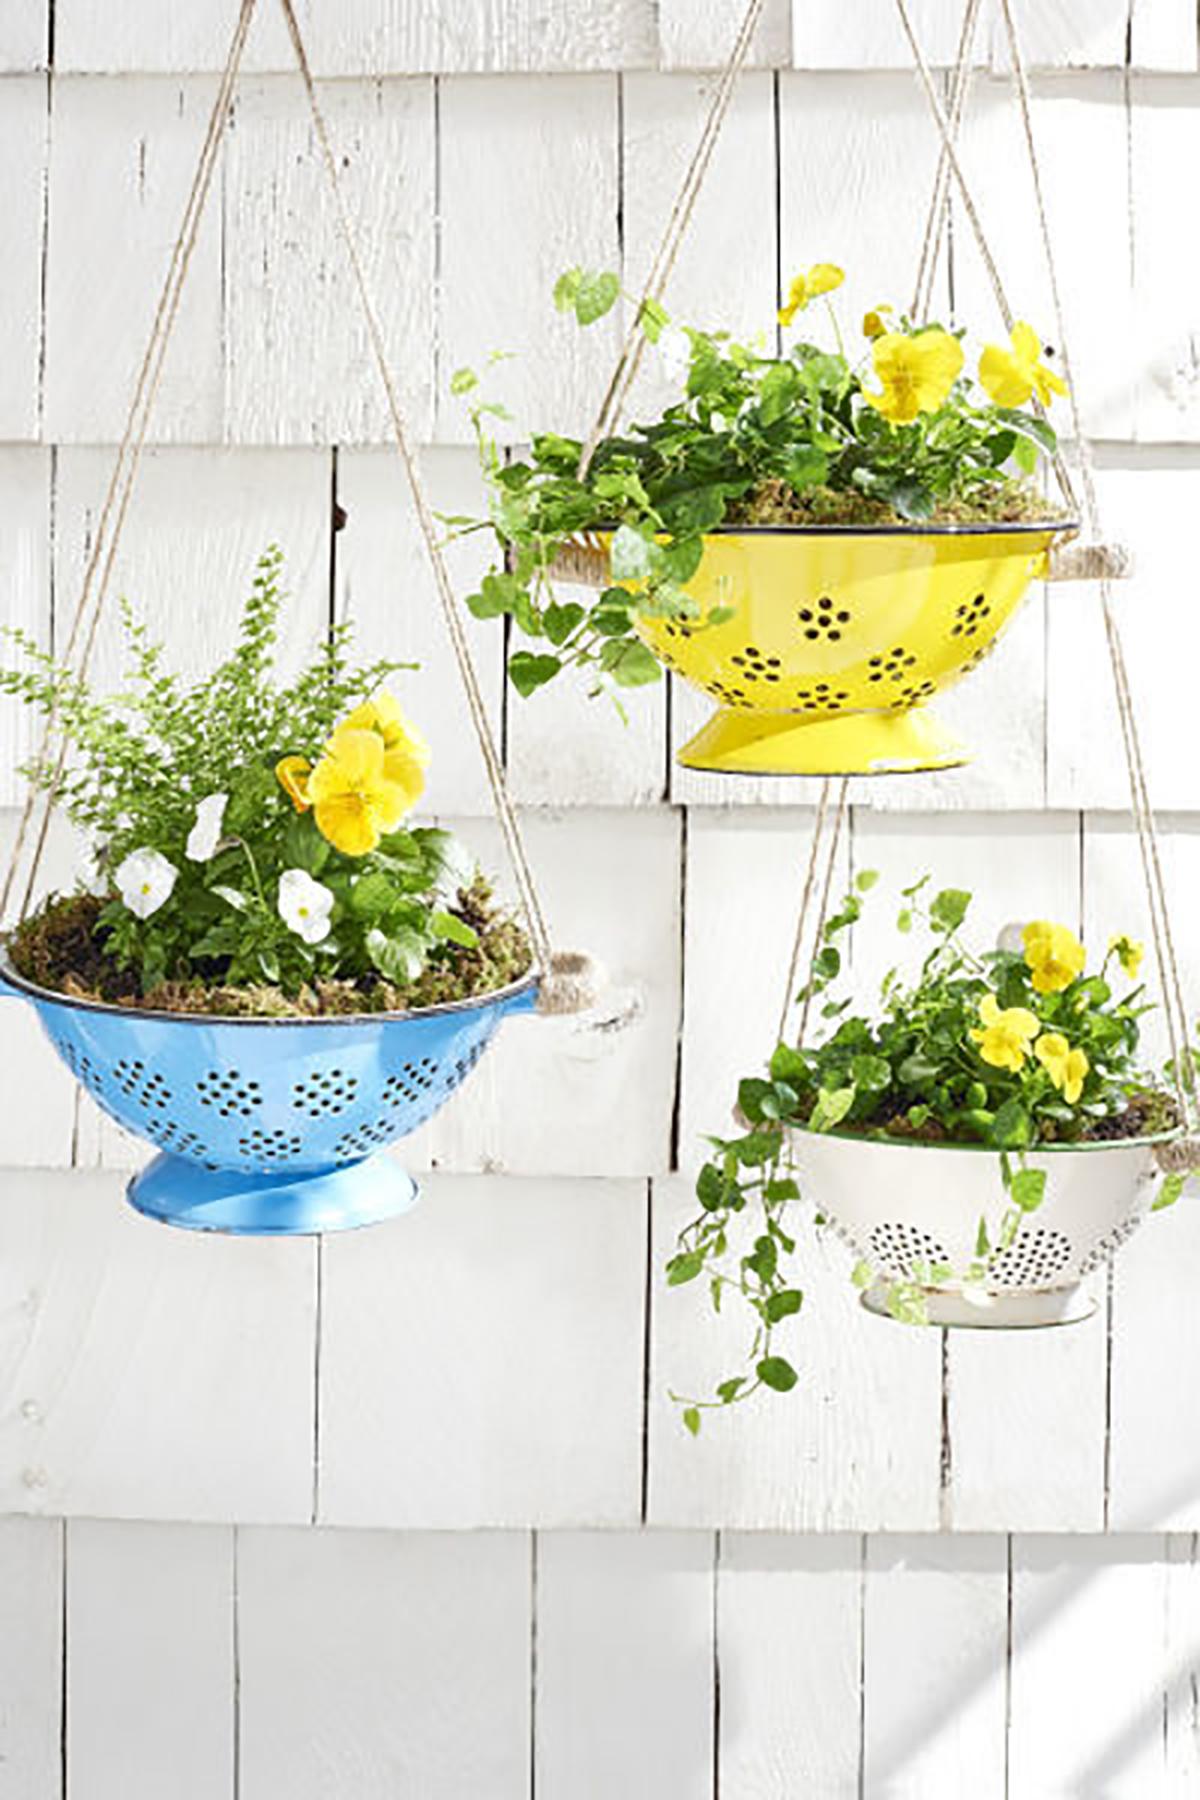 Fake flowers for crafts - Fake Flowers For Crafts 10